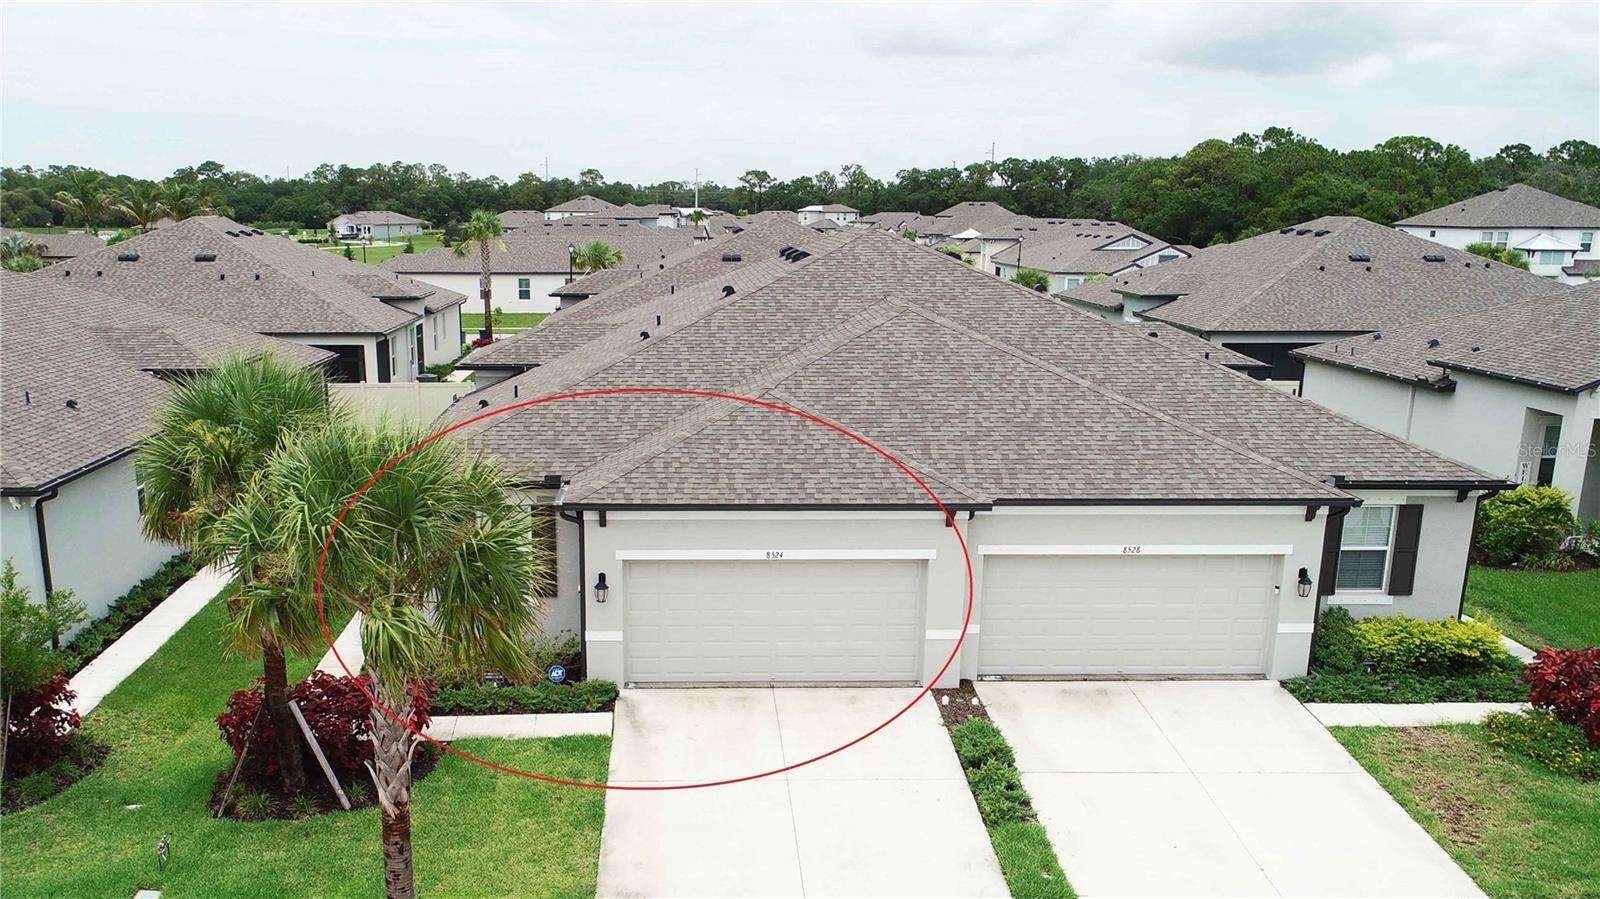 Photo of 8524 CACHE DRIVE, SARASOTA, FL 34240 (MLS # T3313289)